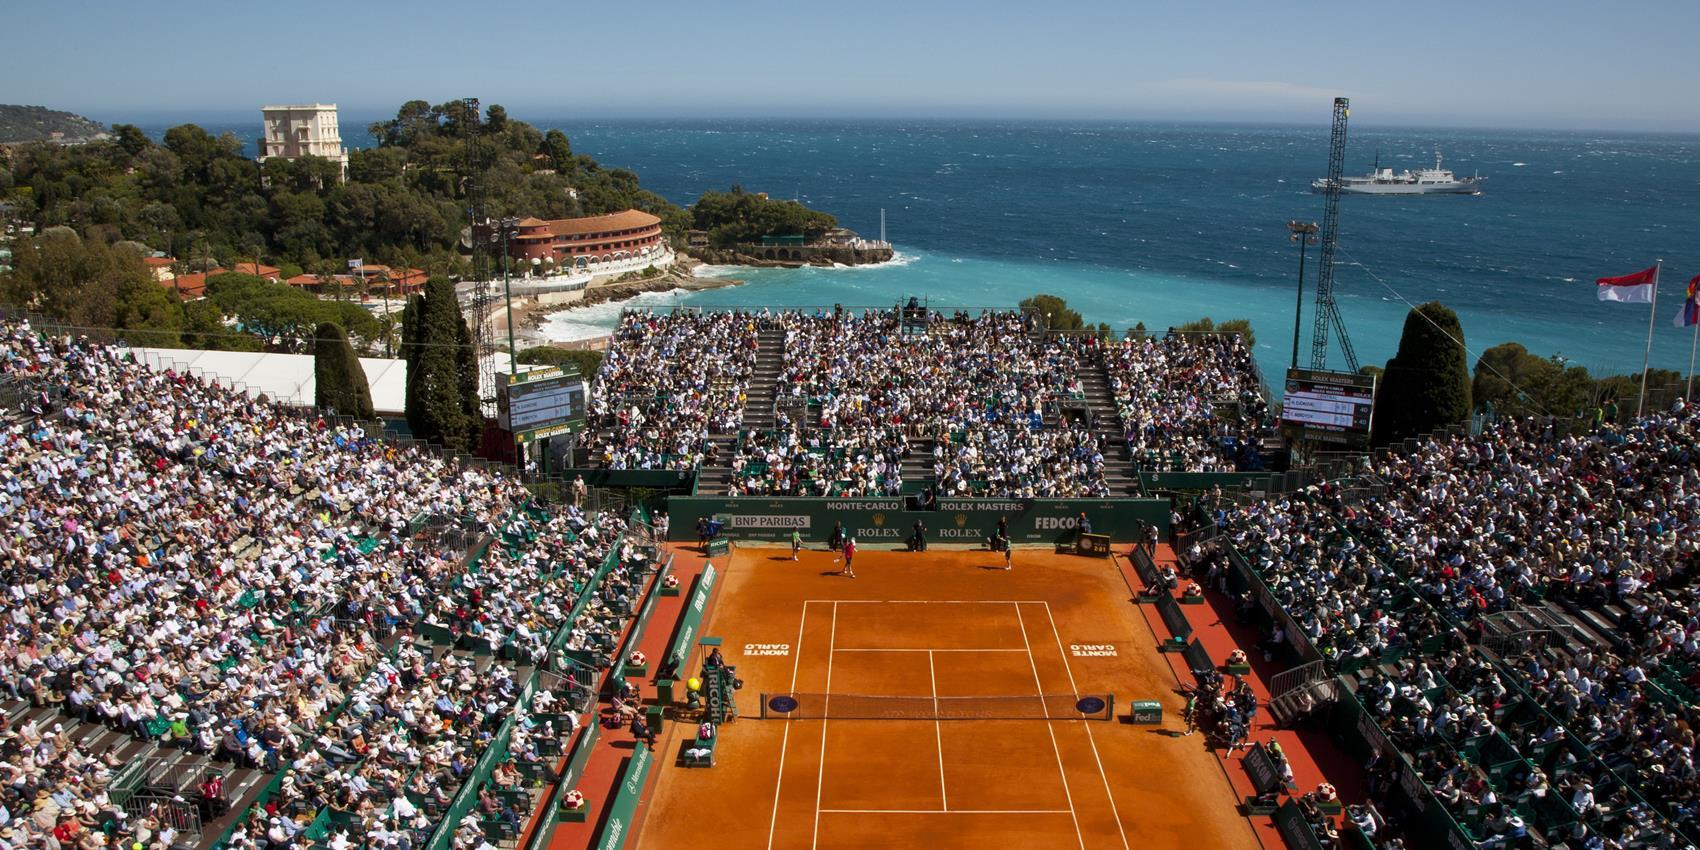 Atp Monaco